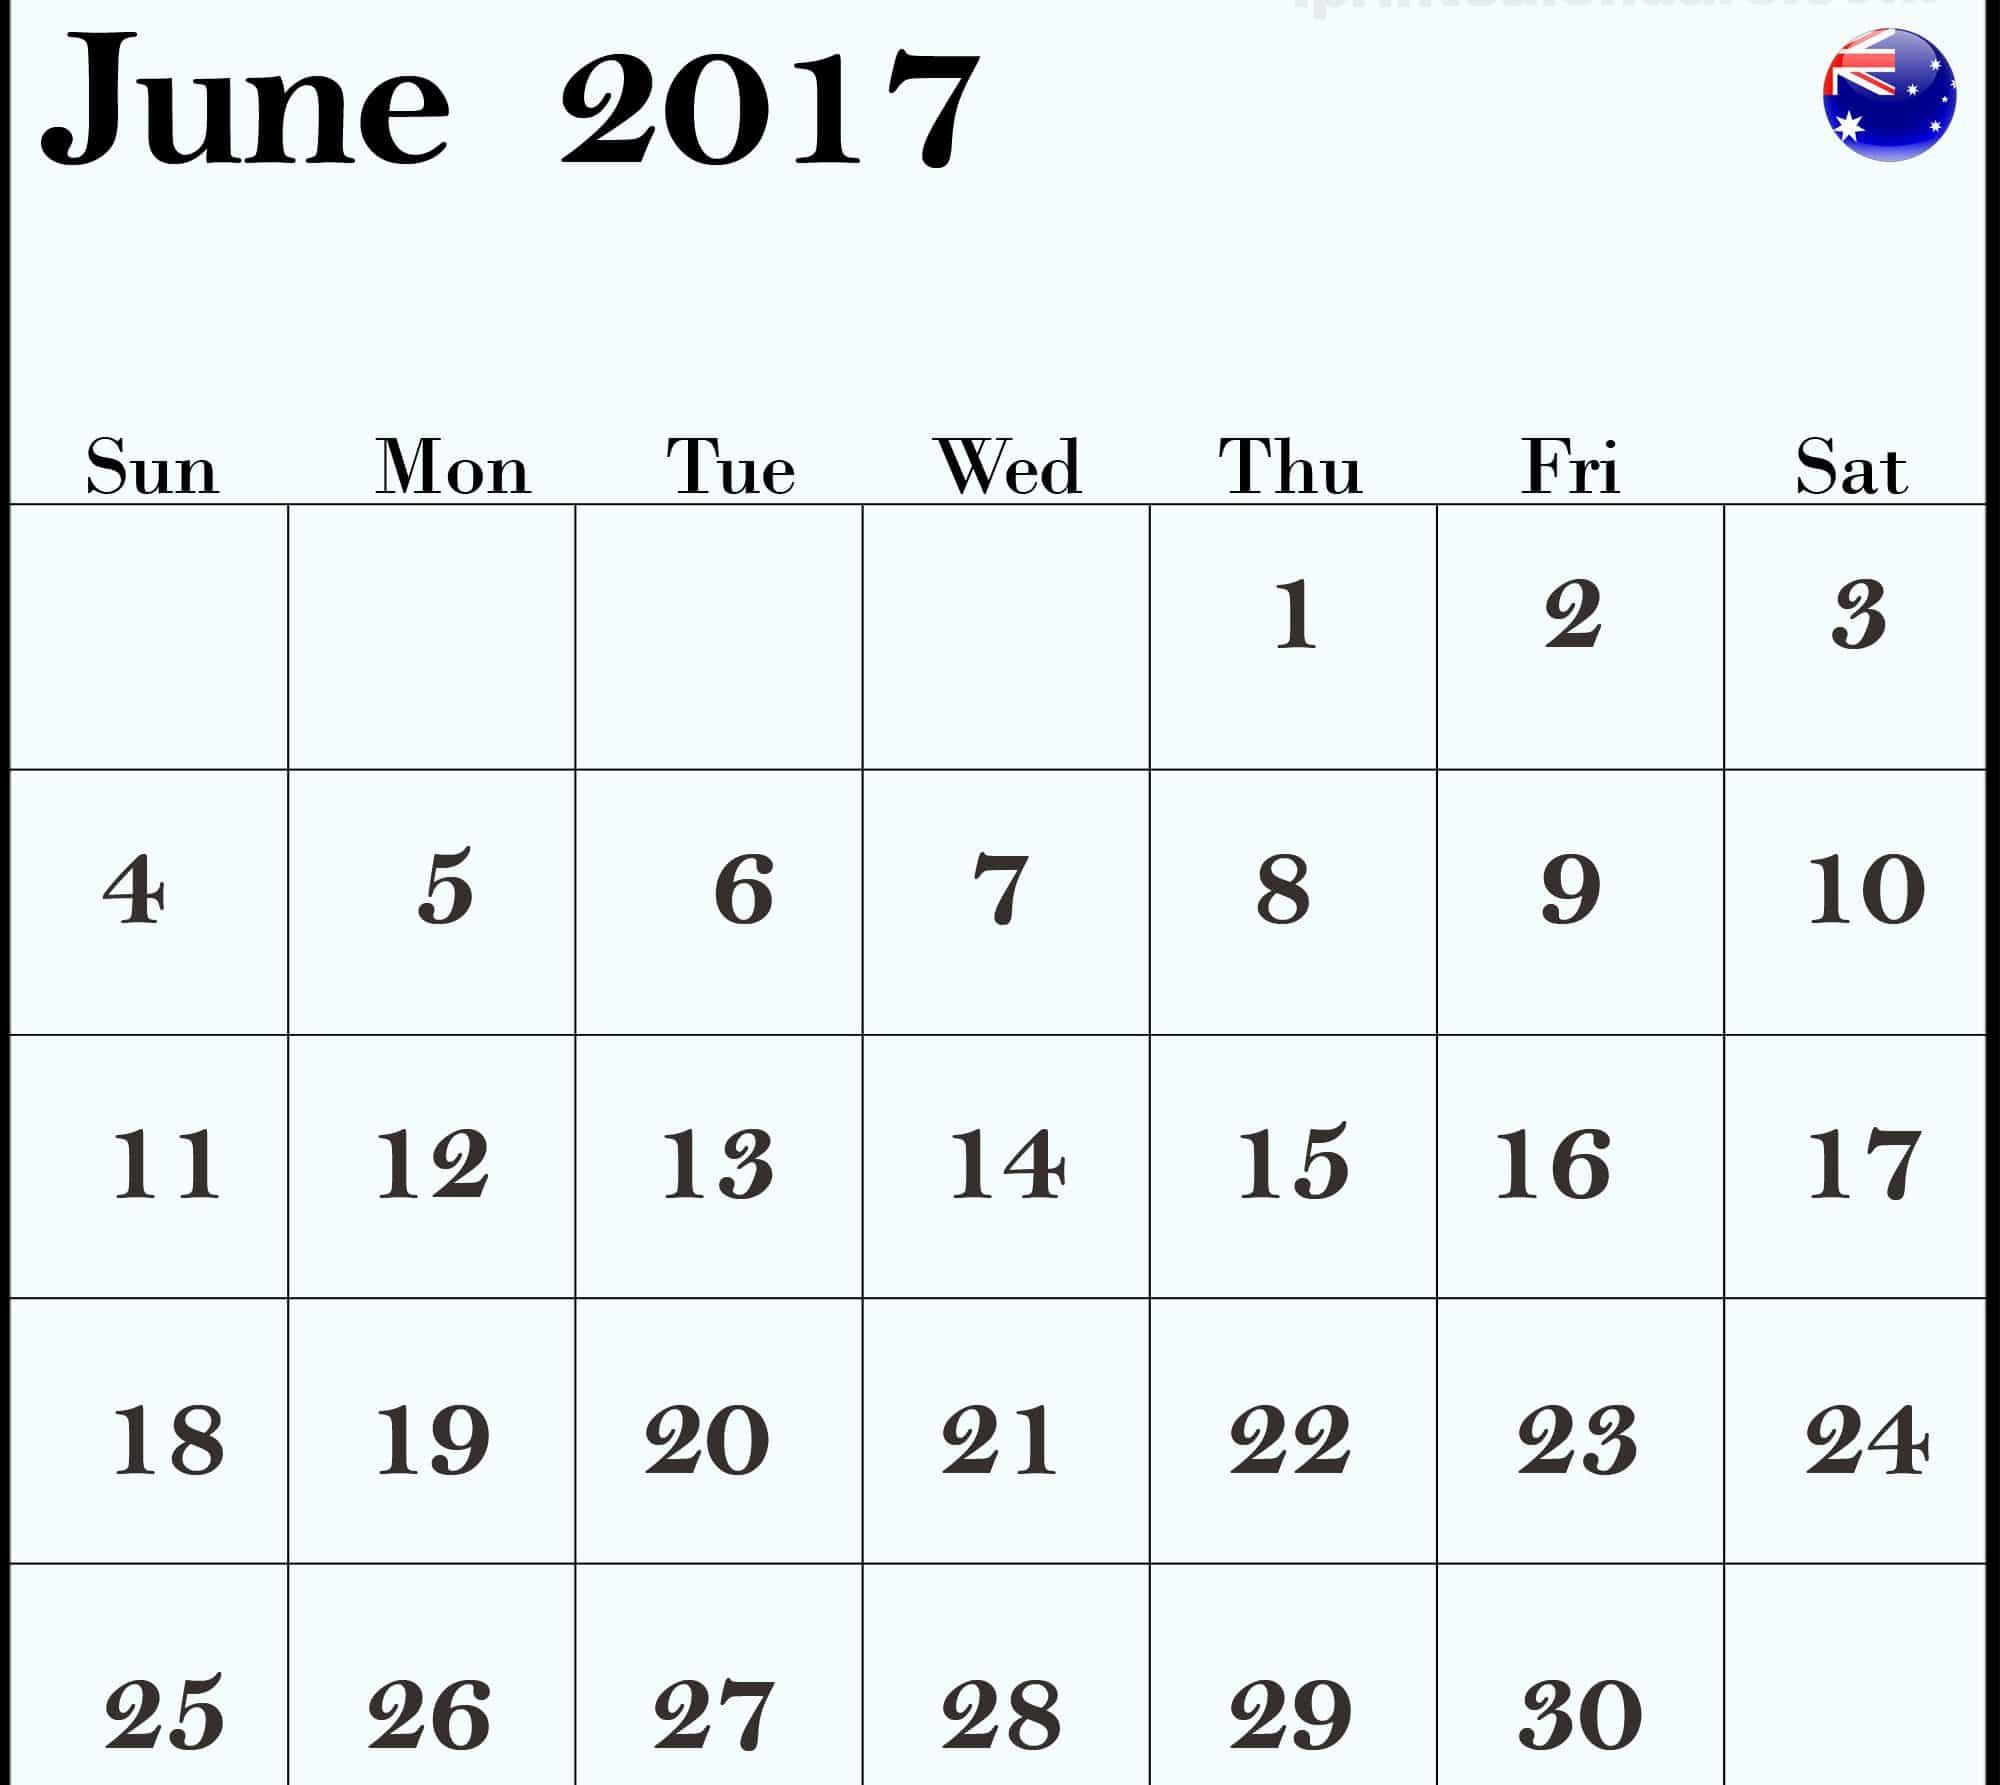 Download June 2017 calendar Australia